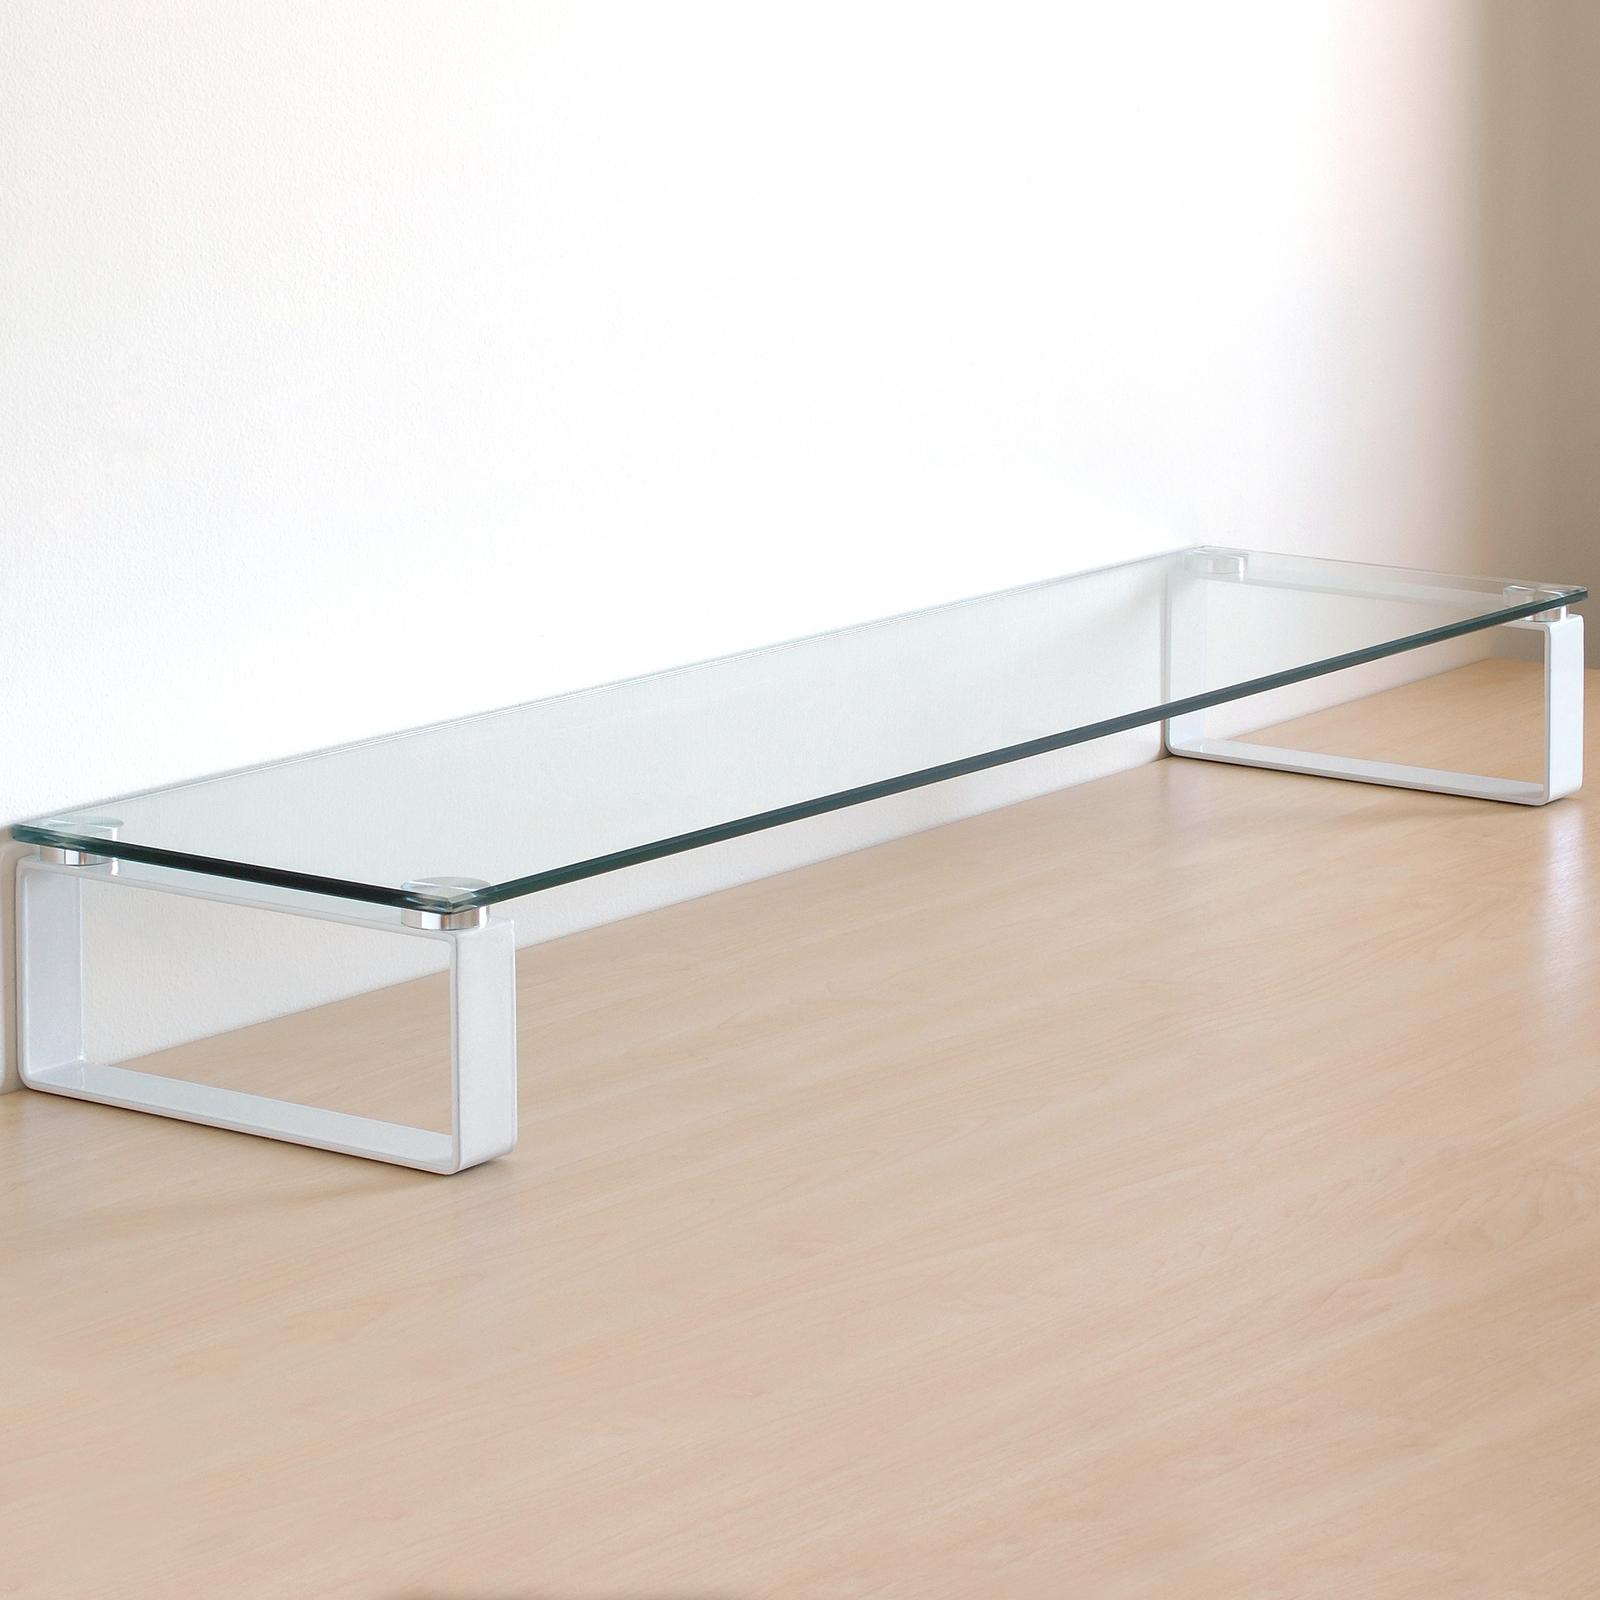 X Large Double Monitor Riser Stand PCiMac Screen TV Display Shelf ClearWhite  eBay